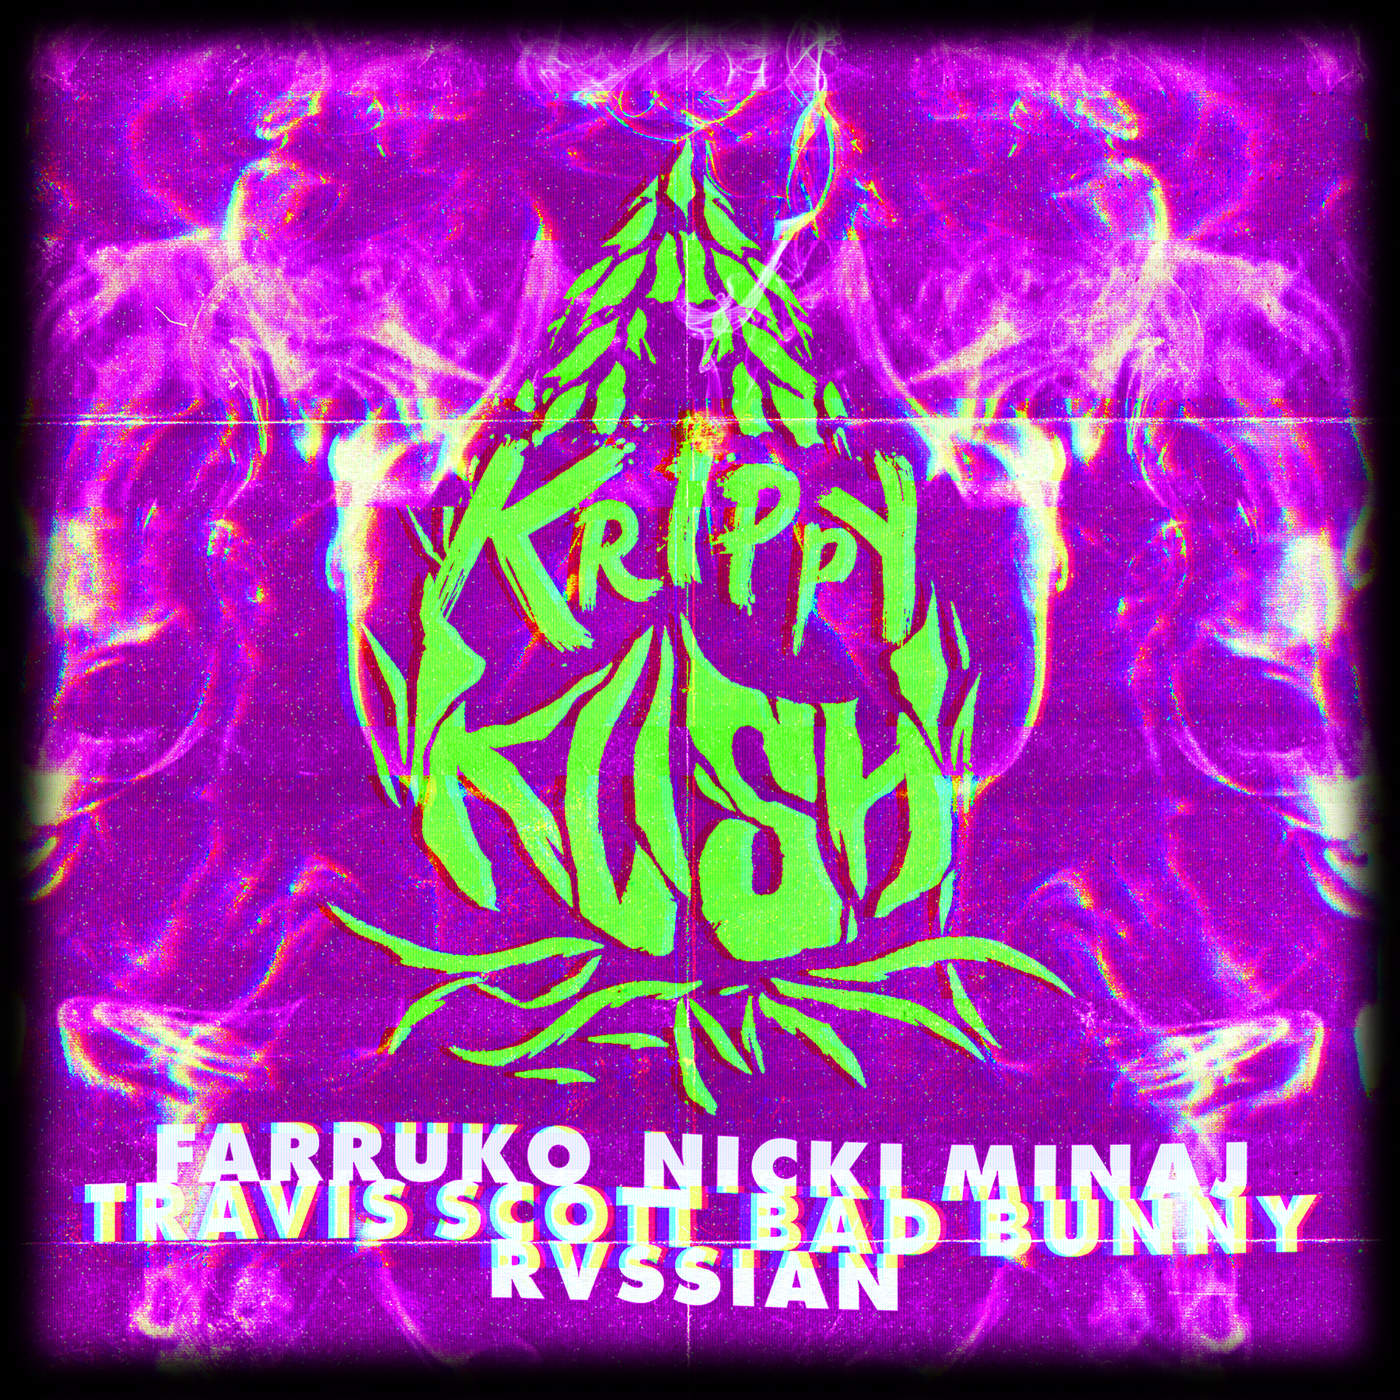 Krippy Kush (Travis Scott Remix) (Single) - Farruko - Nicki Minaj - Travis Scott